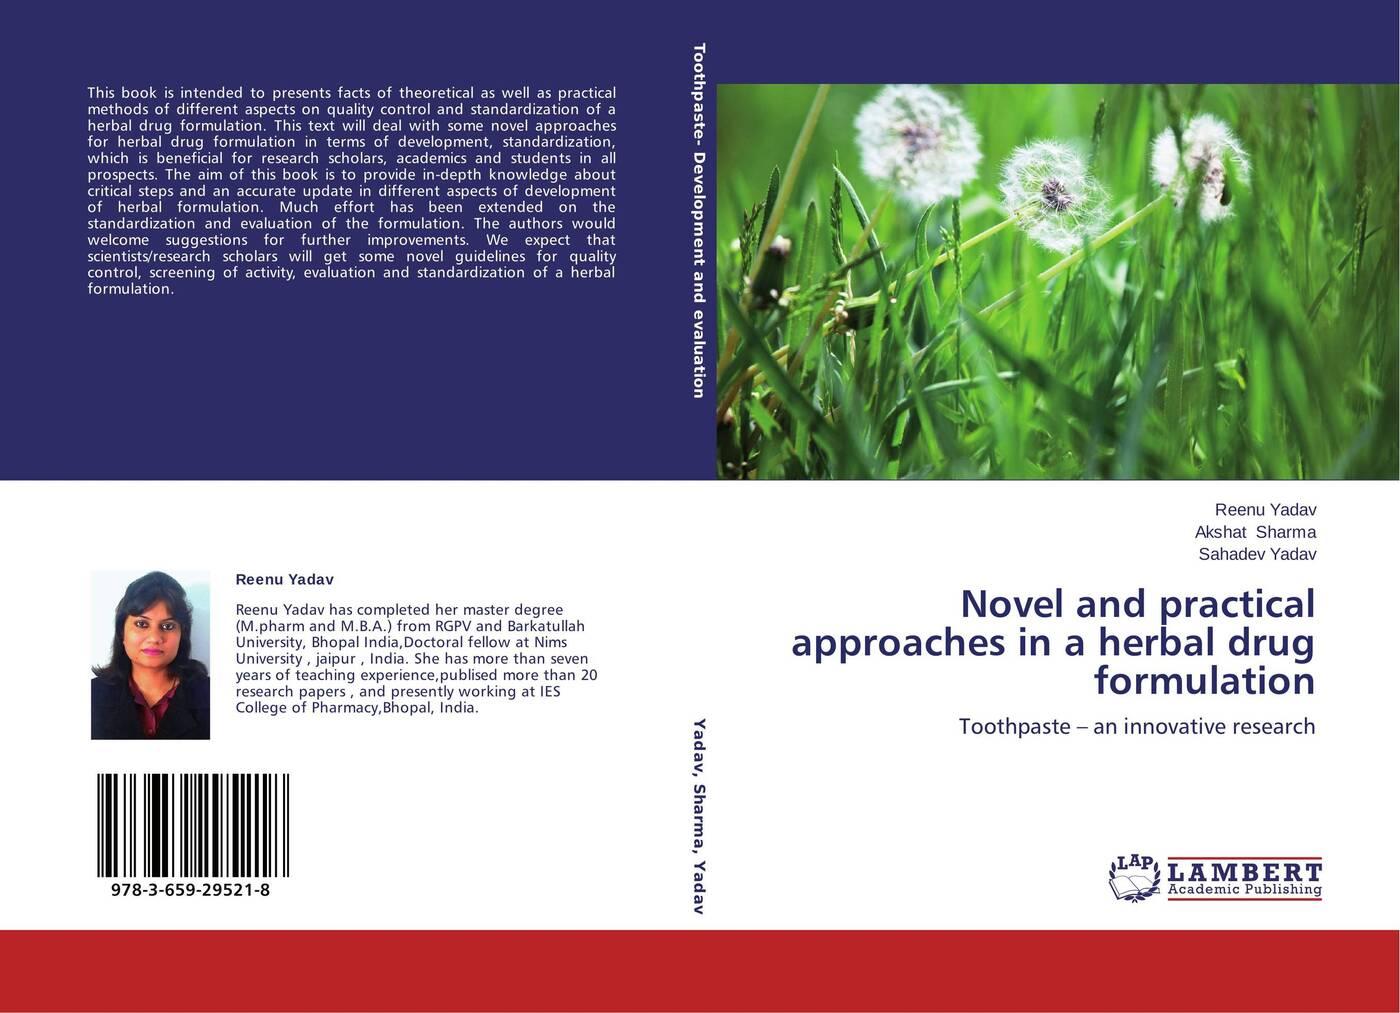 Reenu Yadav,Akshat Sharma and Sahadev Yadav Novel practical approaches in a herbal drug formulation